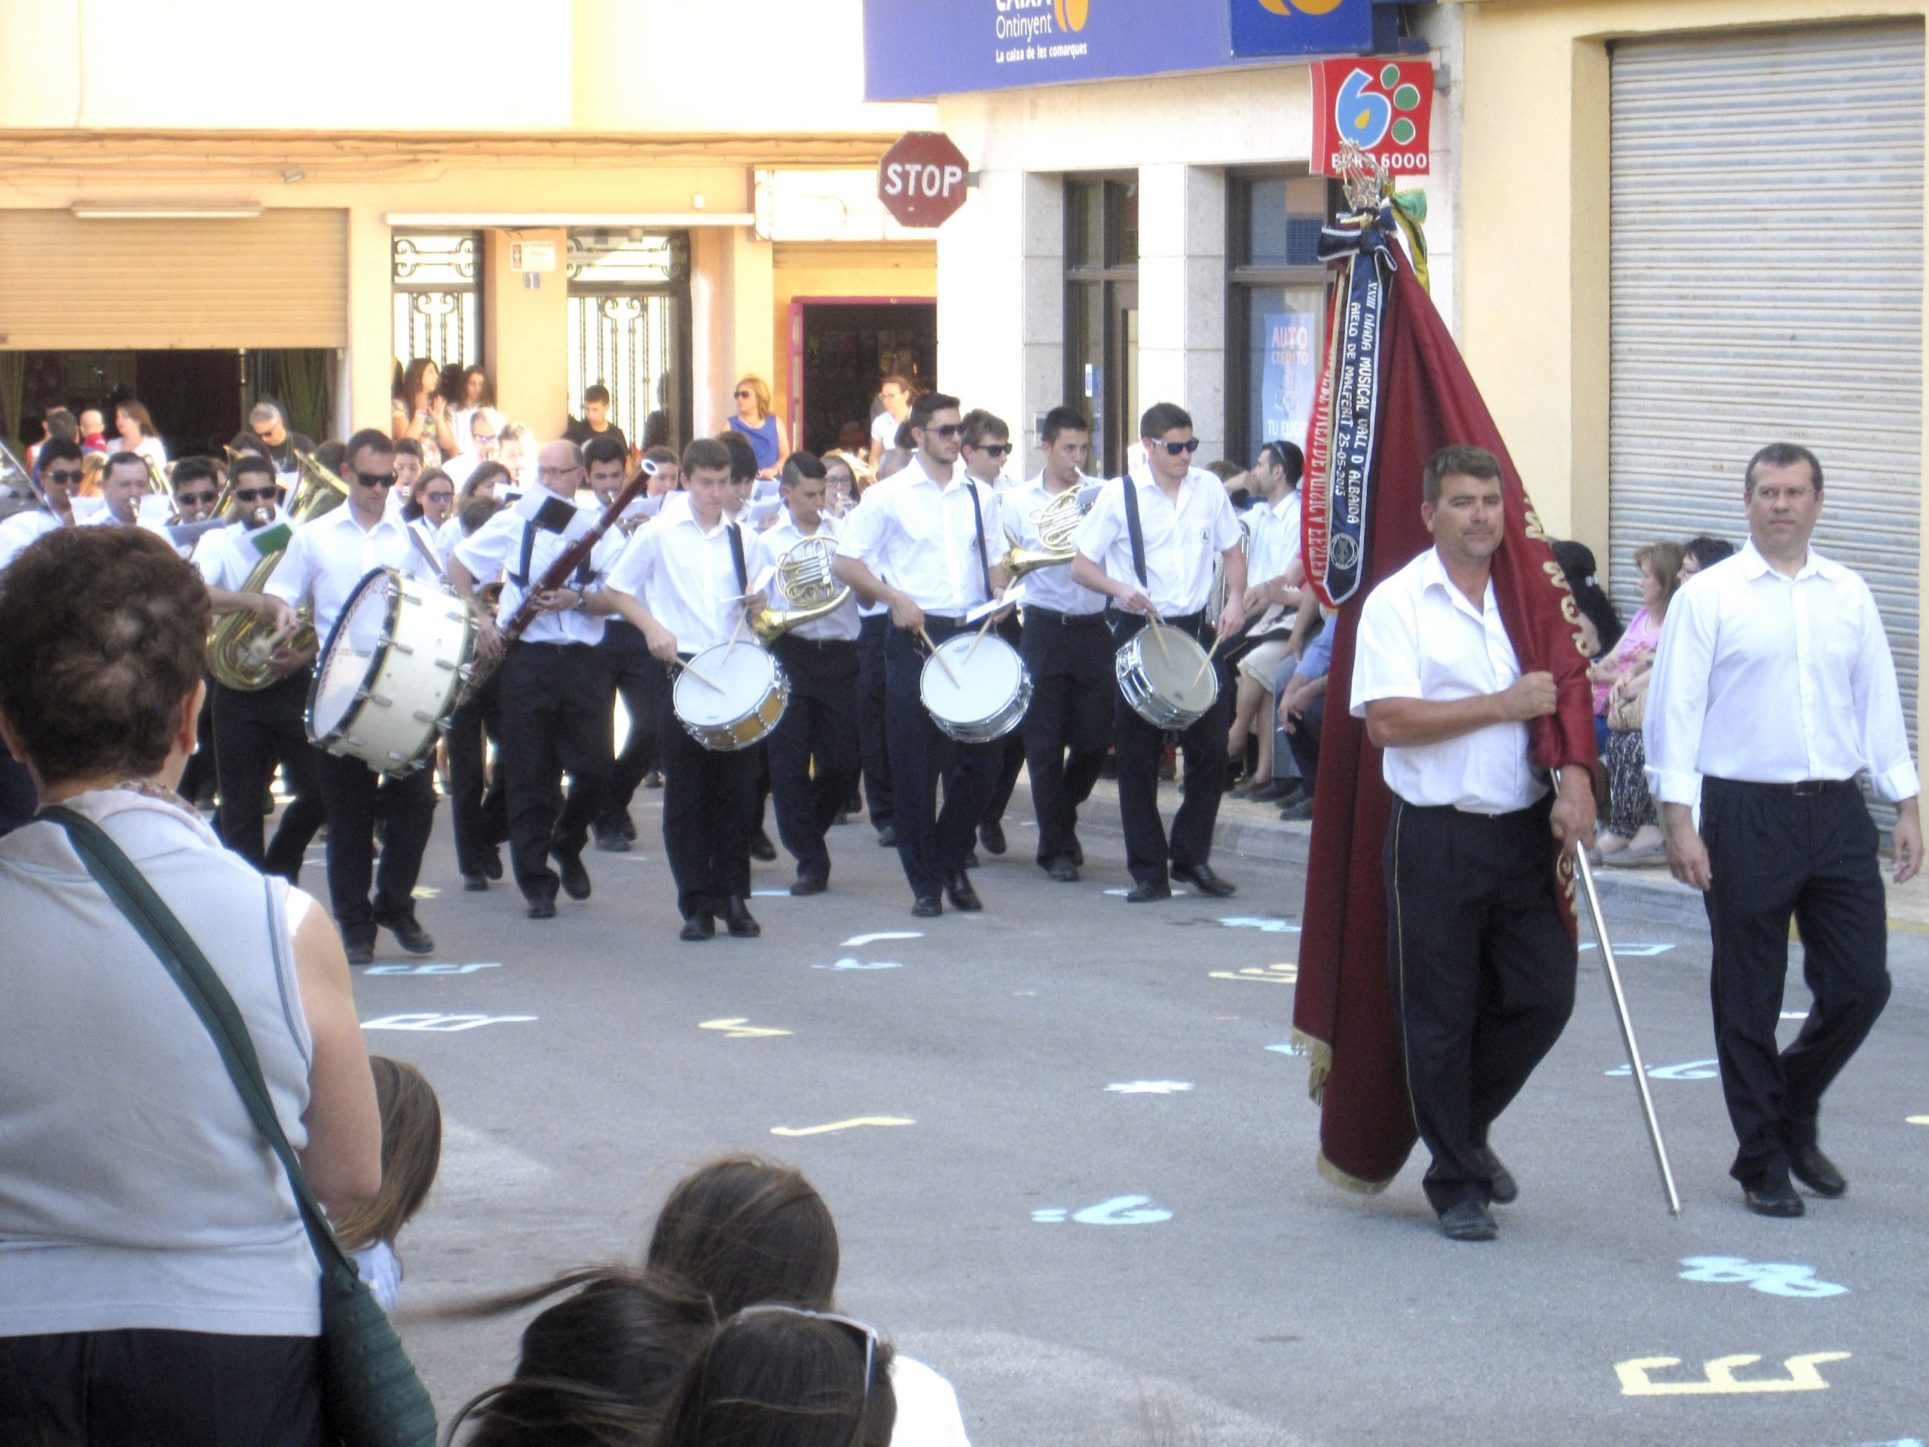 1.000 músics omplin Ontinyent en la XXVII Diada Musical El Periòdic d'Ontinyent - Noticies a Ontinyent